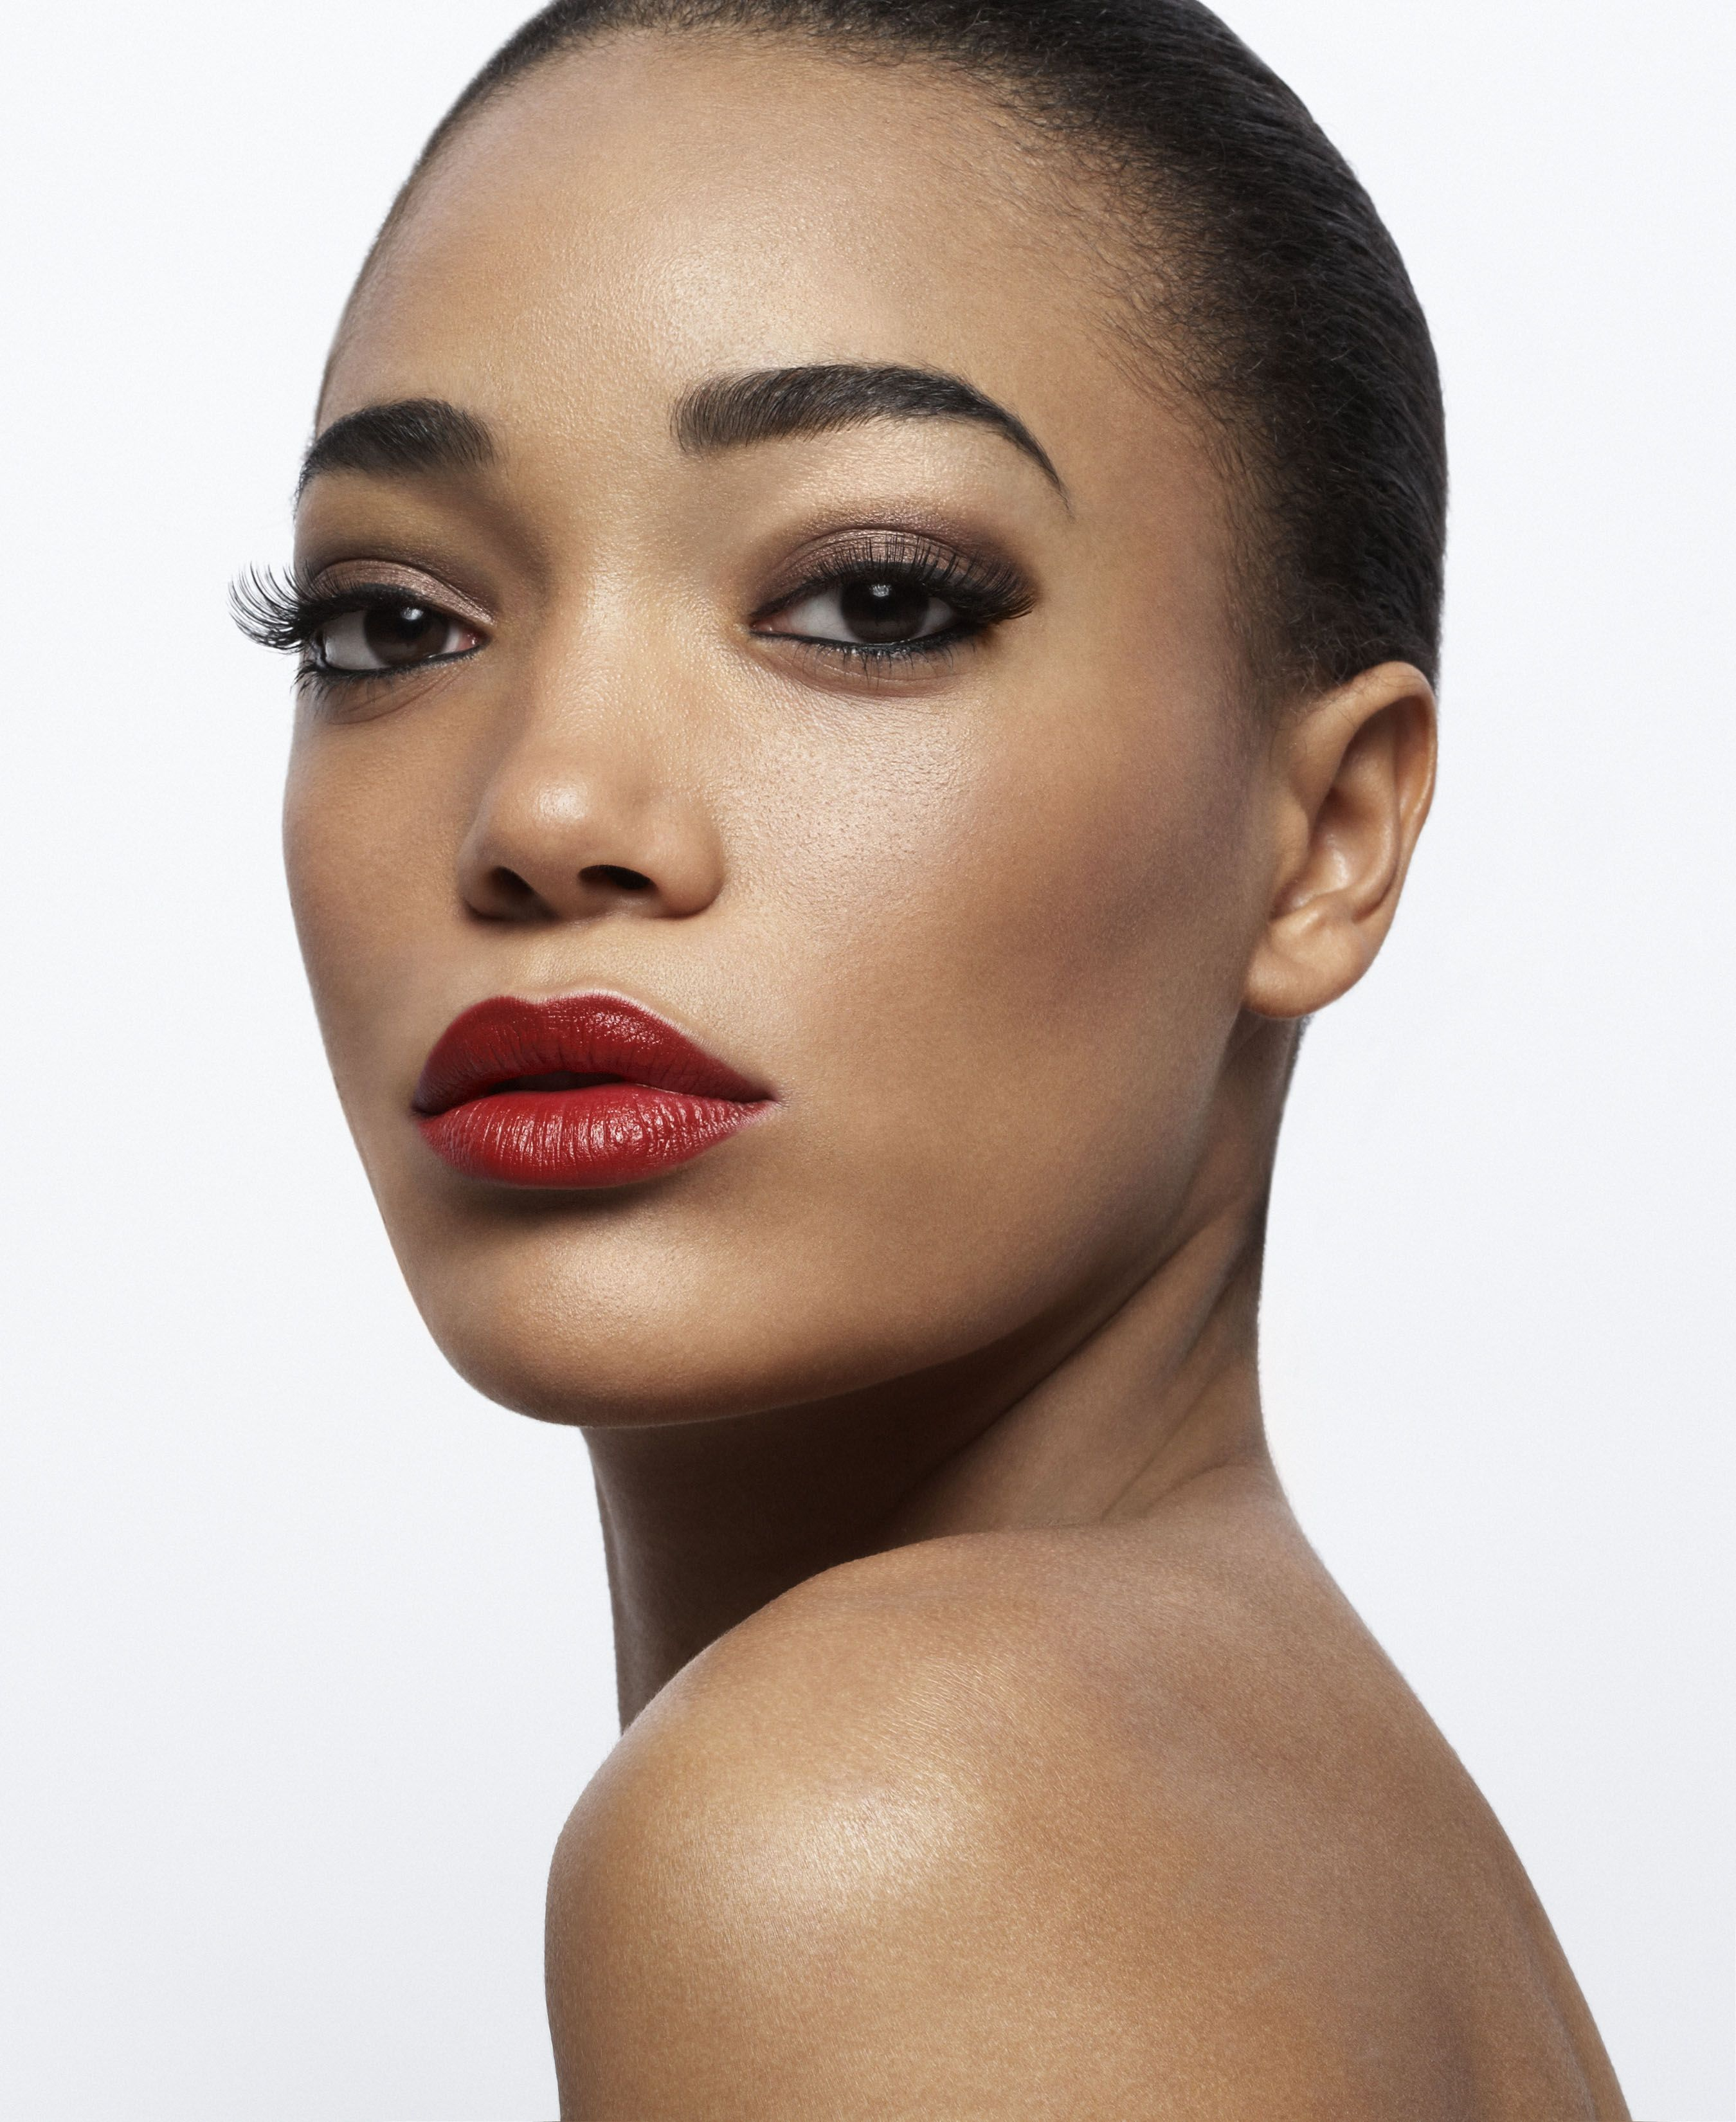 Colour Me Beautiful! Makeup Tips by Shomya Bright